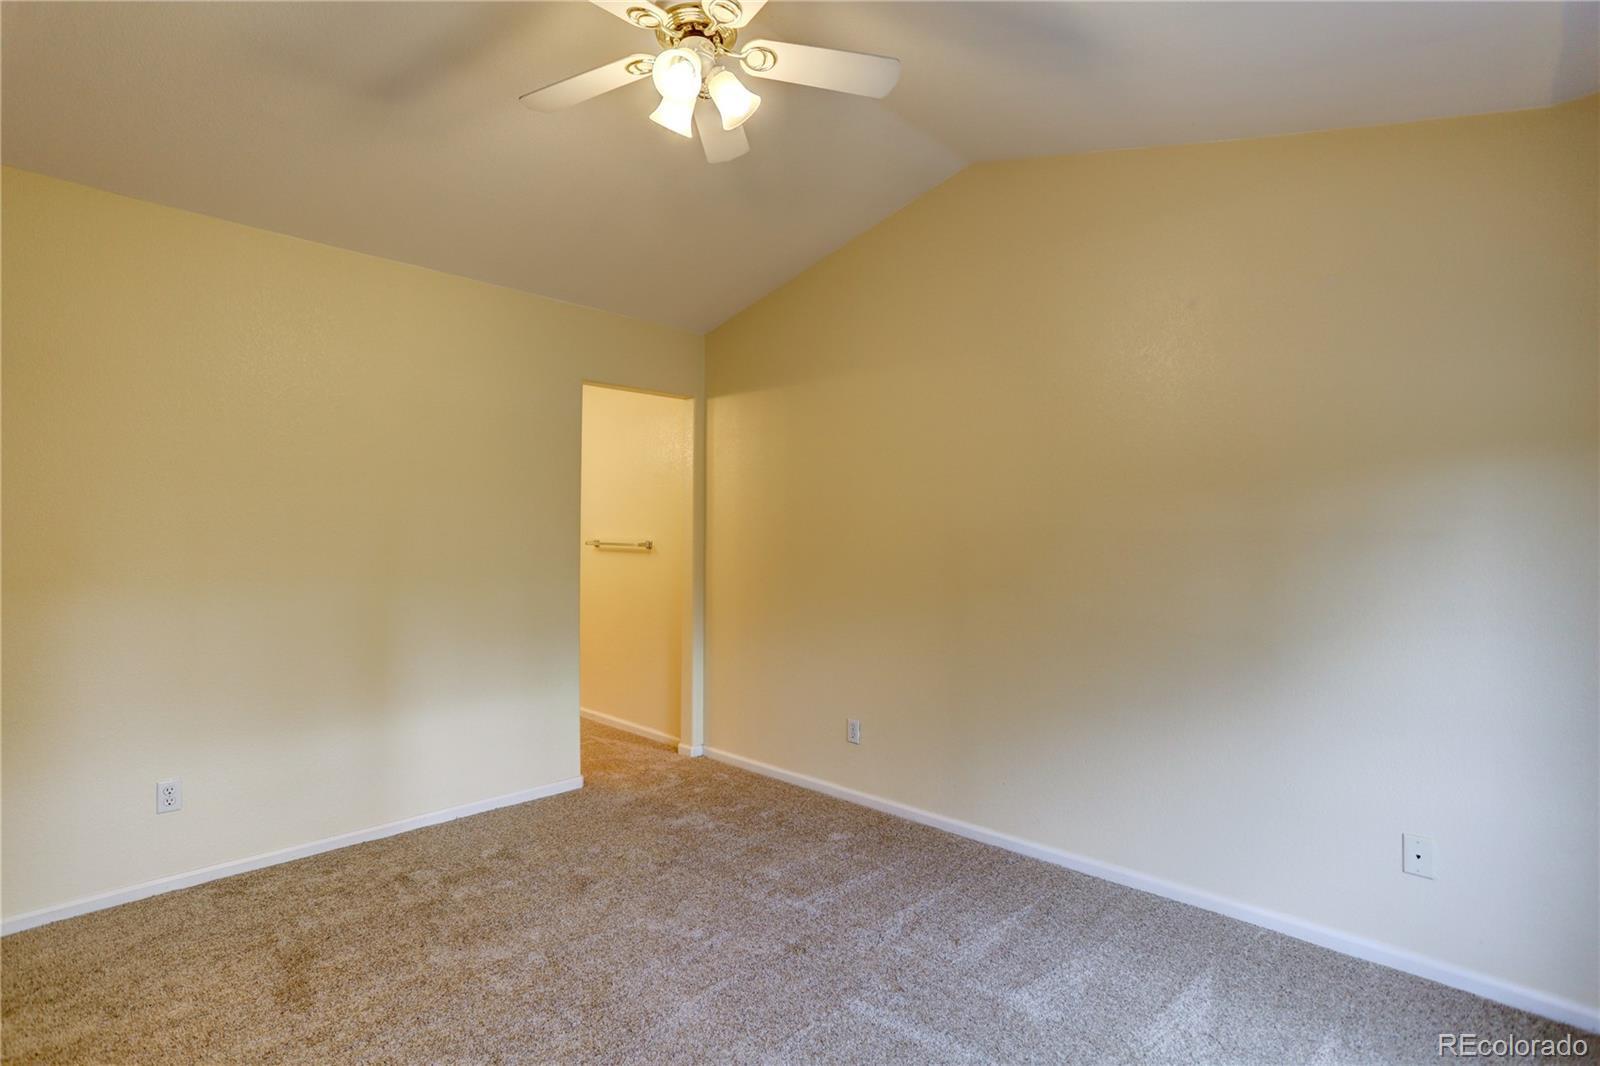 MLS# 2836182 - 24 - 7700 W Grant Ranch Boulevard #10D, Littleton, CO 80123